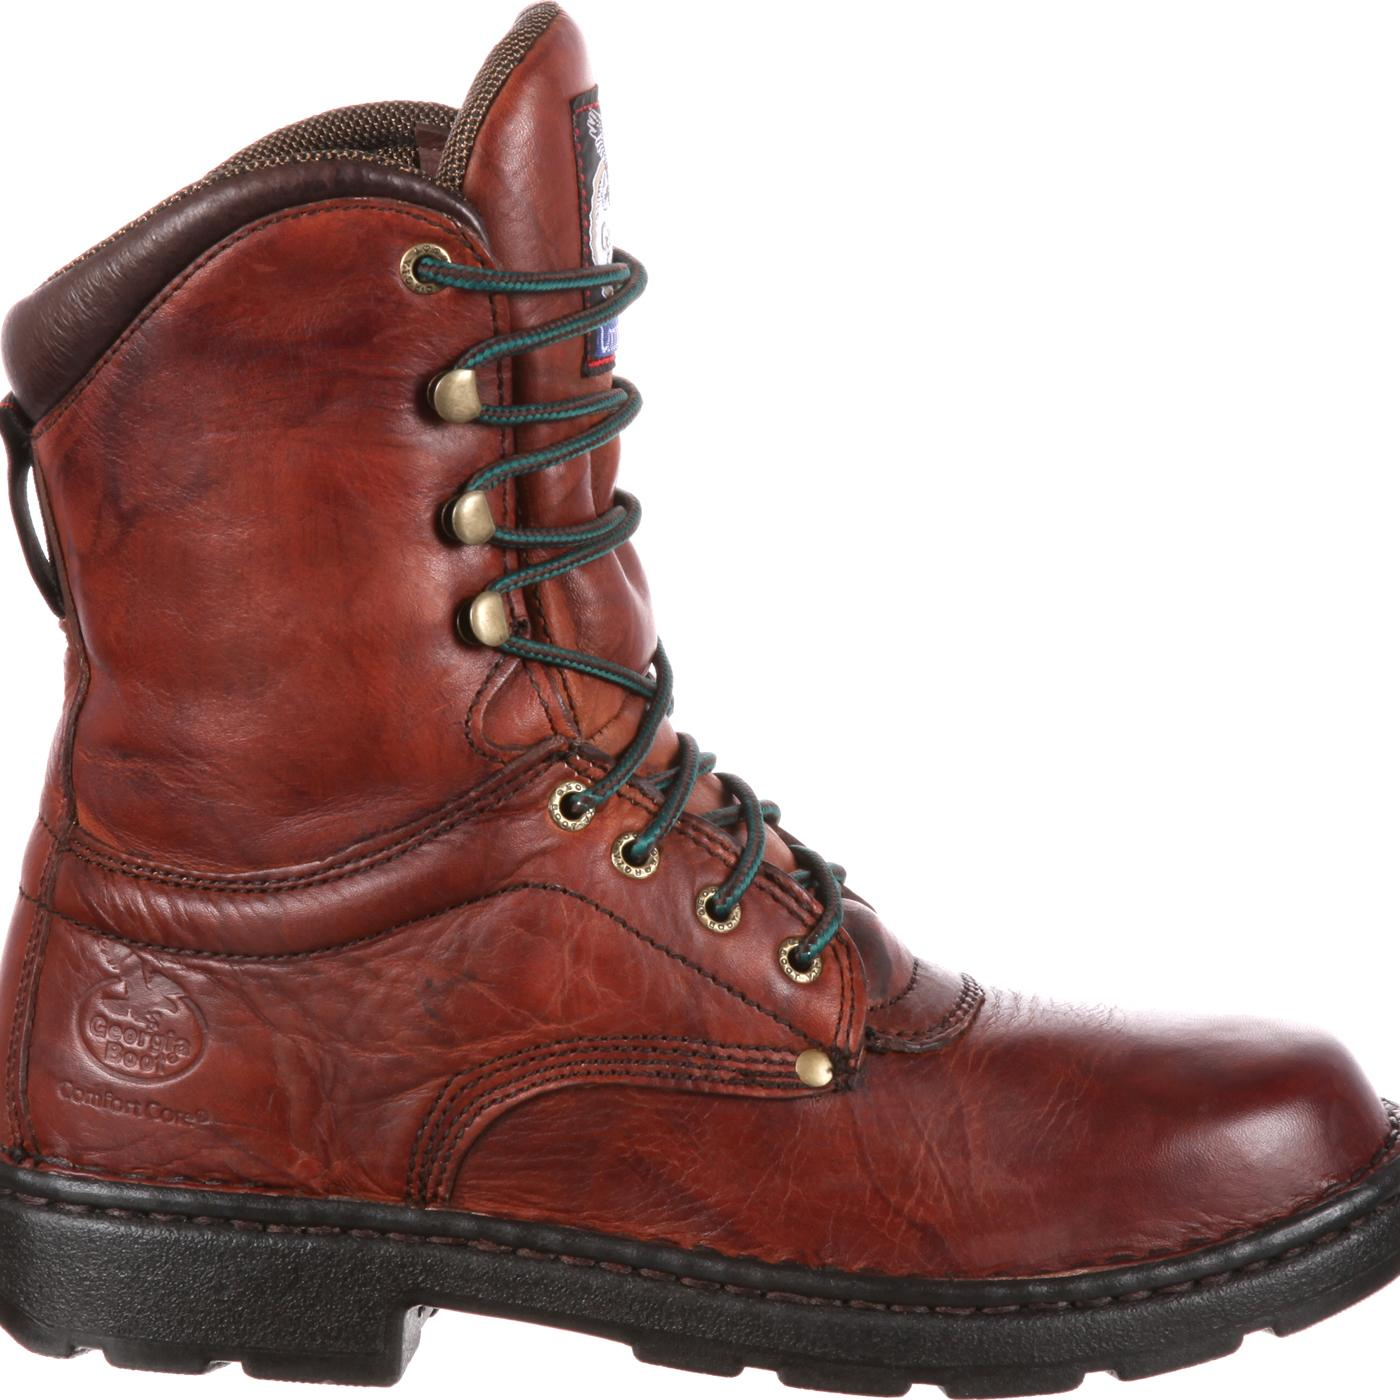 Light Work Mens Boots: Georgia Eagle Light Men's Comfort Work Boot, Style G8083